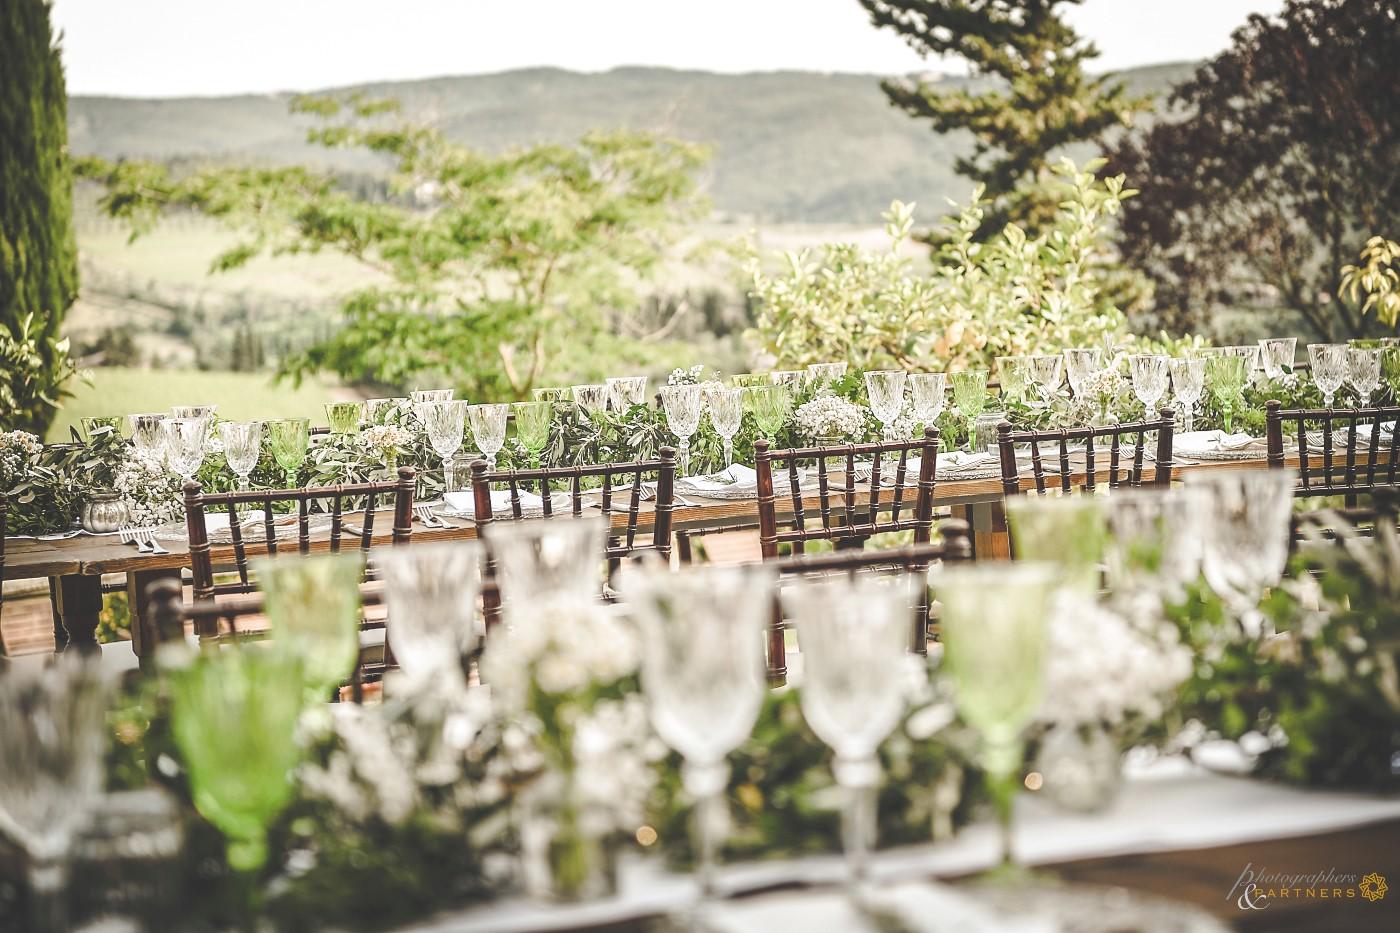 🍃 Wedding table decorations 🍃